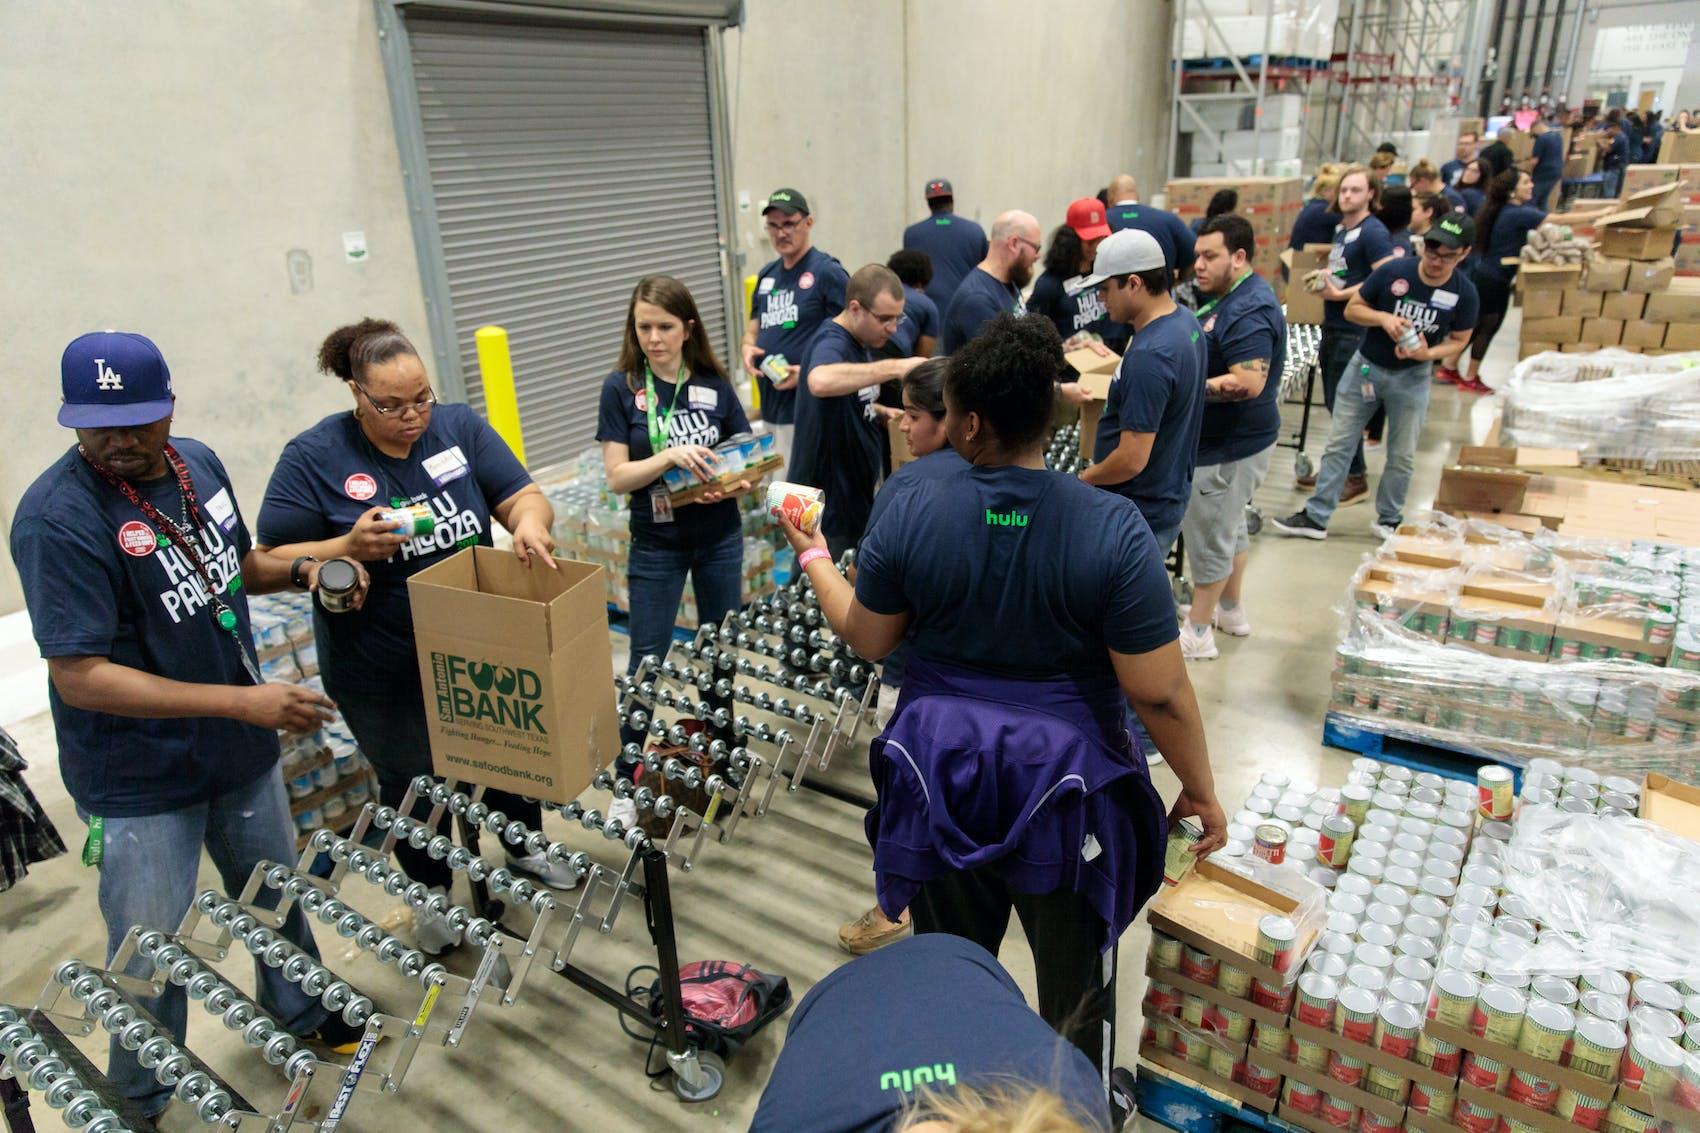 hulu employee giveback packing boxes at food bank